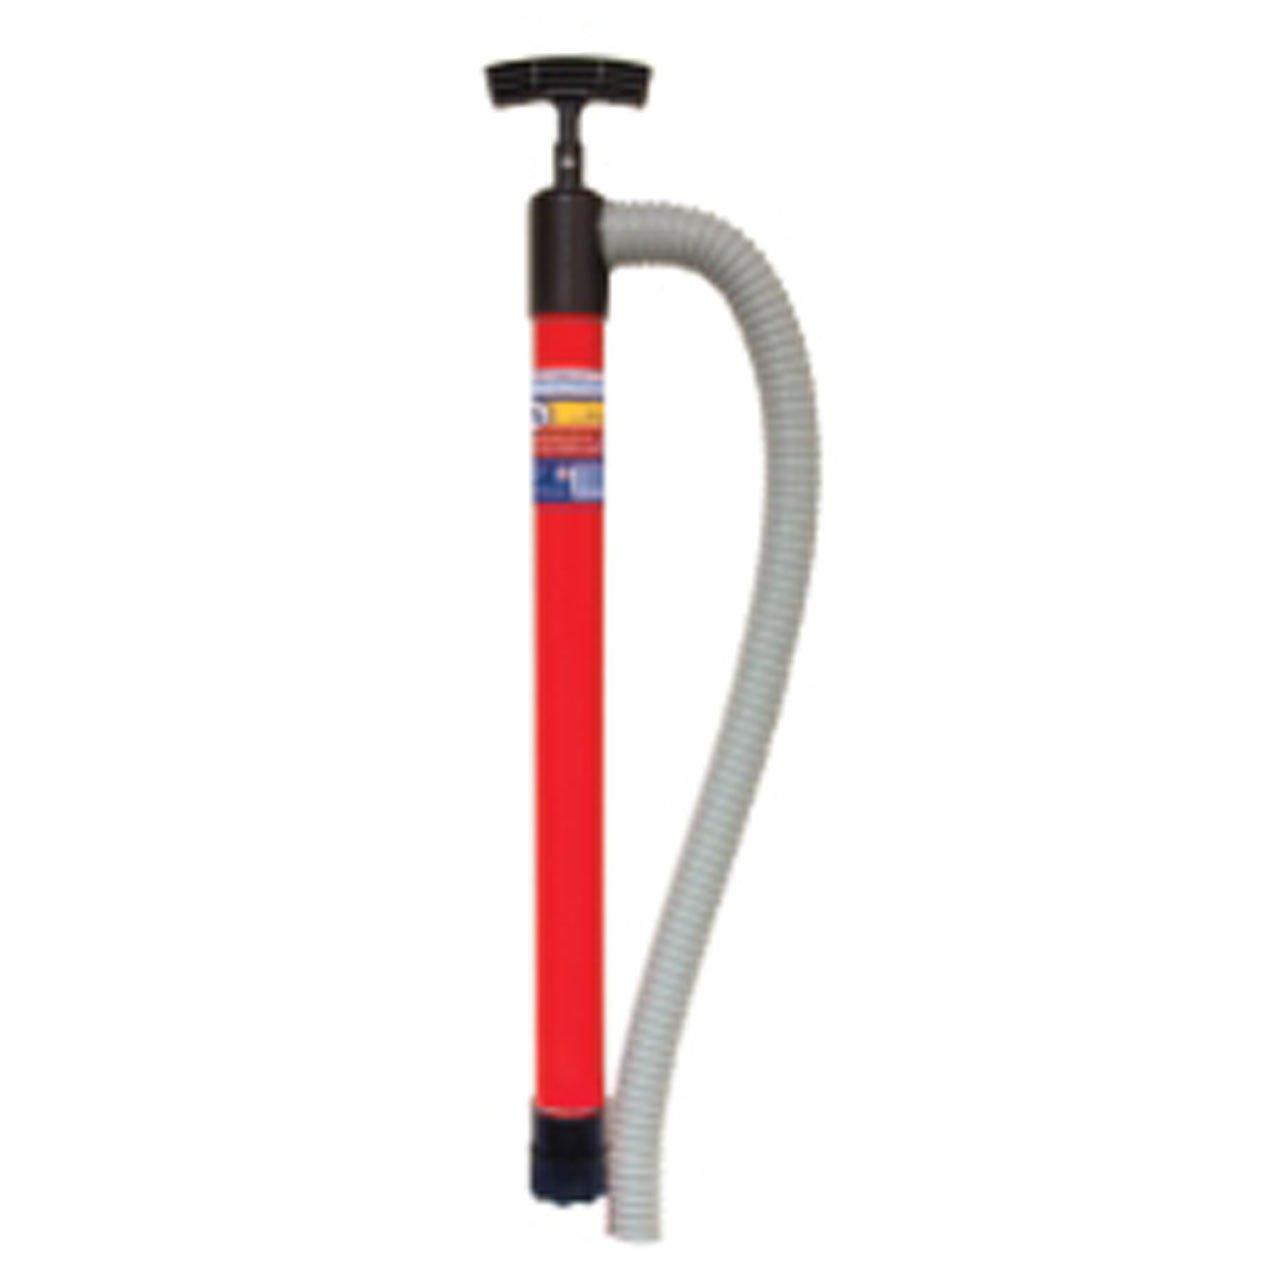 King Innovation 48024 Siphon Utility Pump 24-Inch Pump x 36-Inch Hose